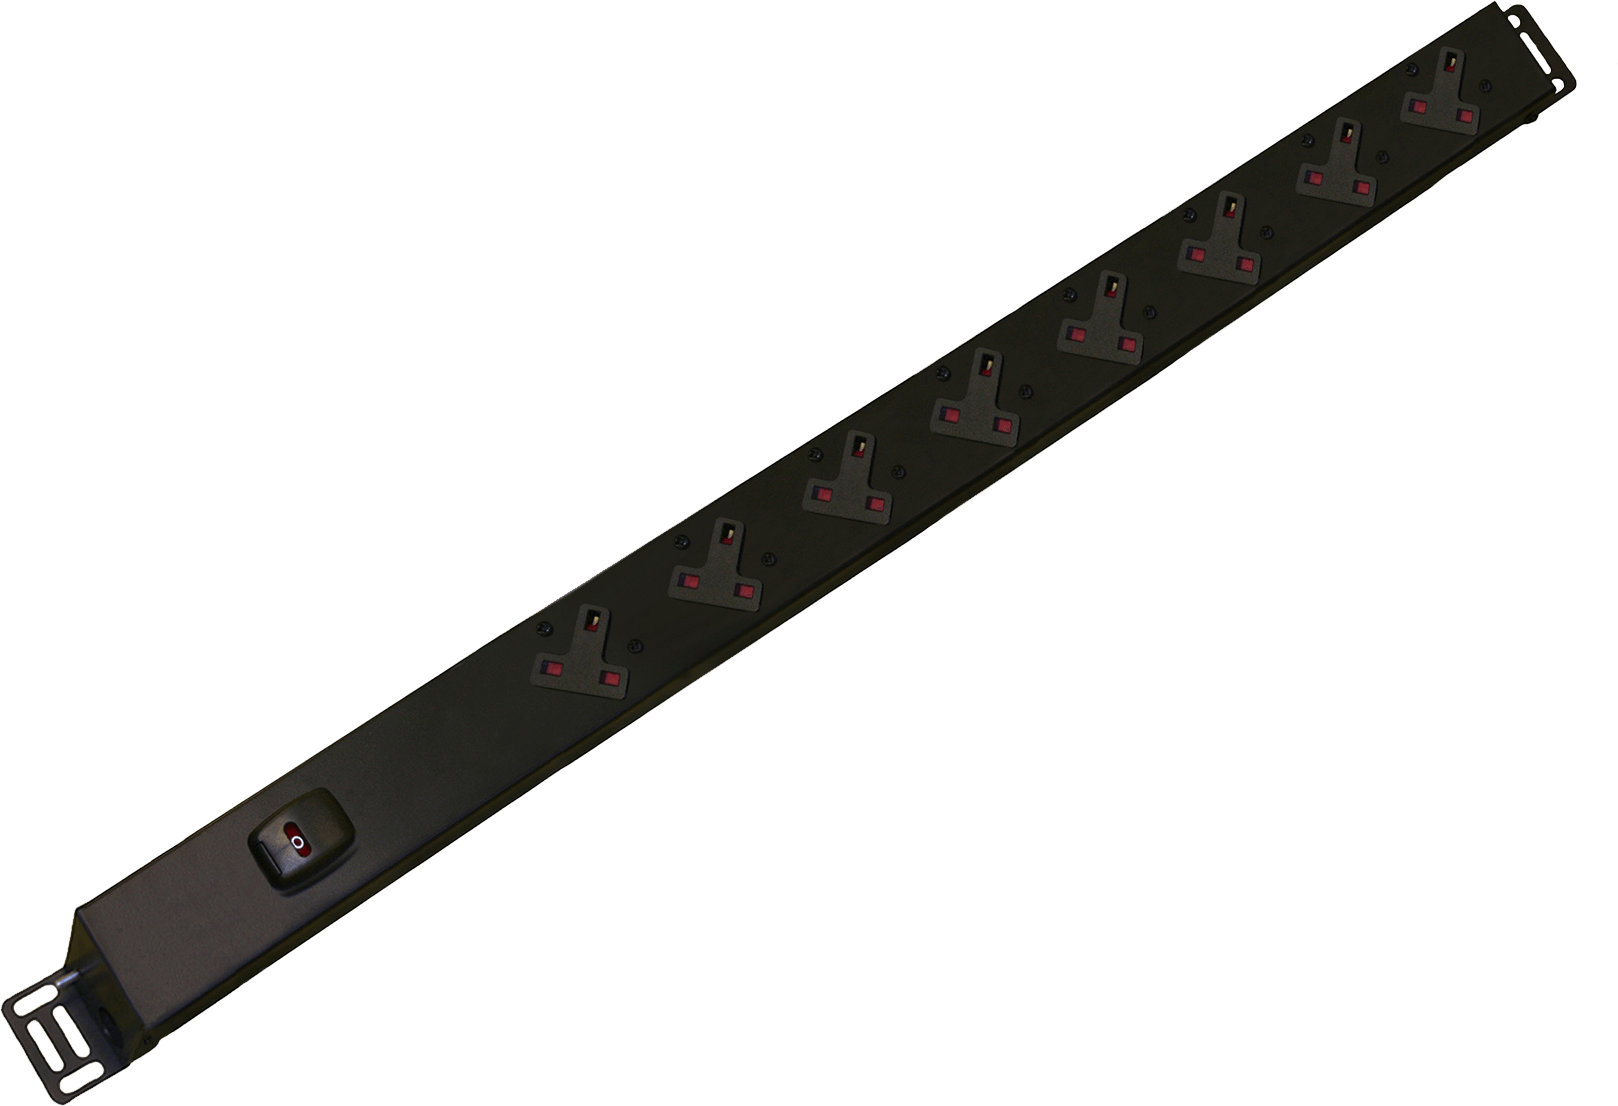 An image of 8 way vertical slimline PDU r/h c/w uk plug